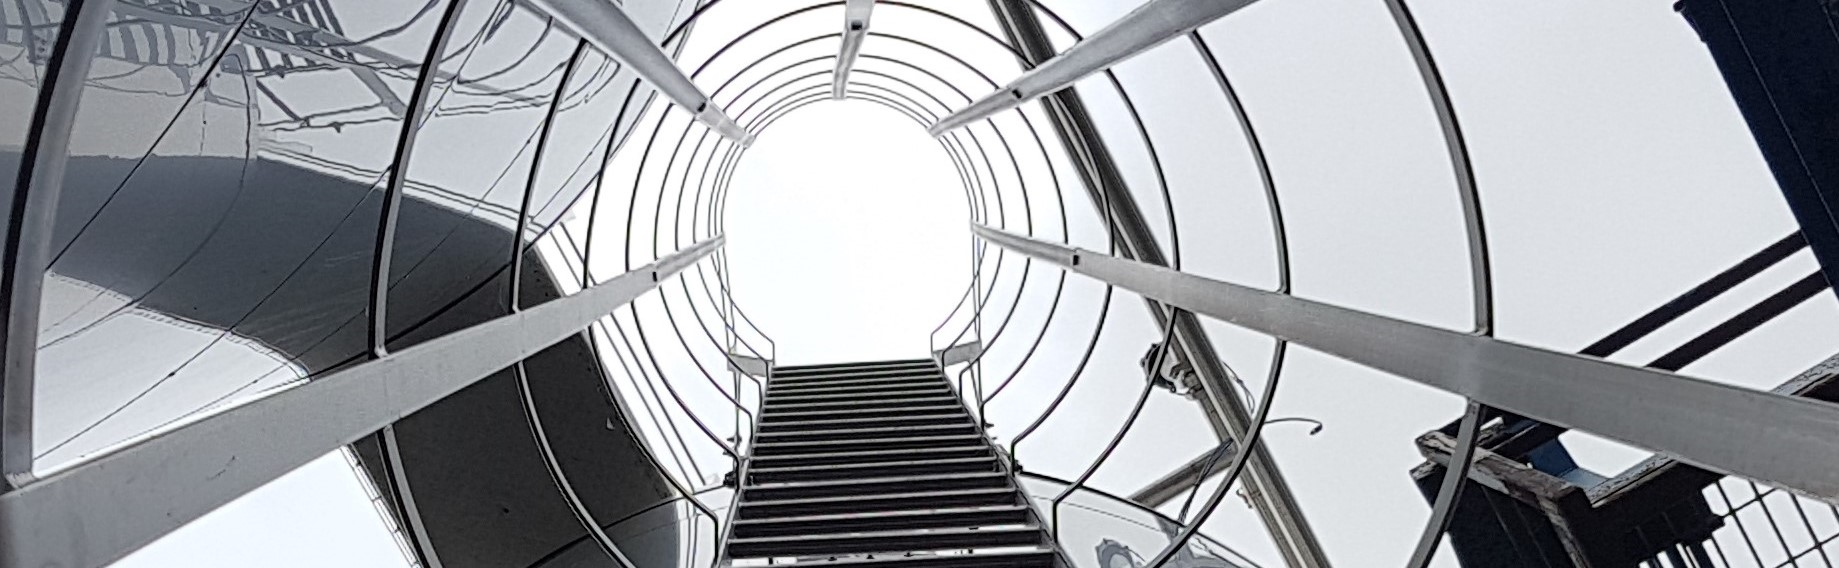 ladder slice